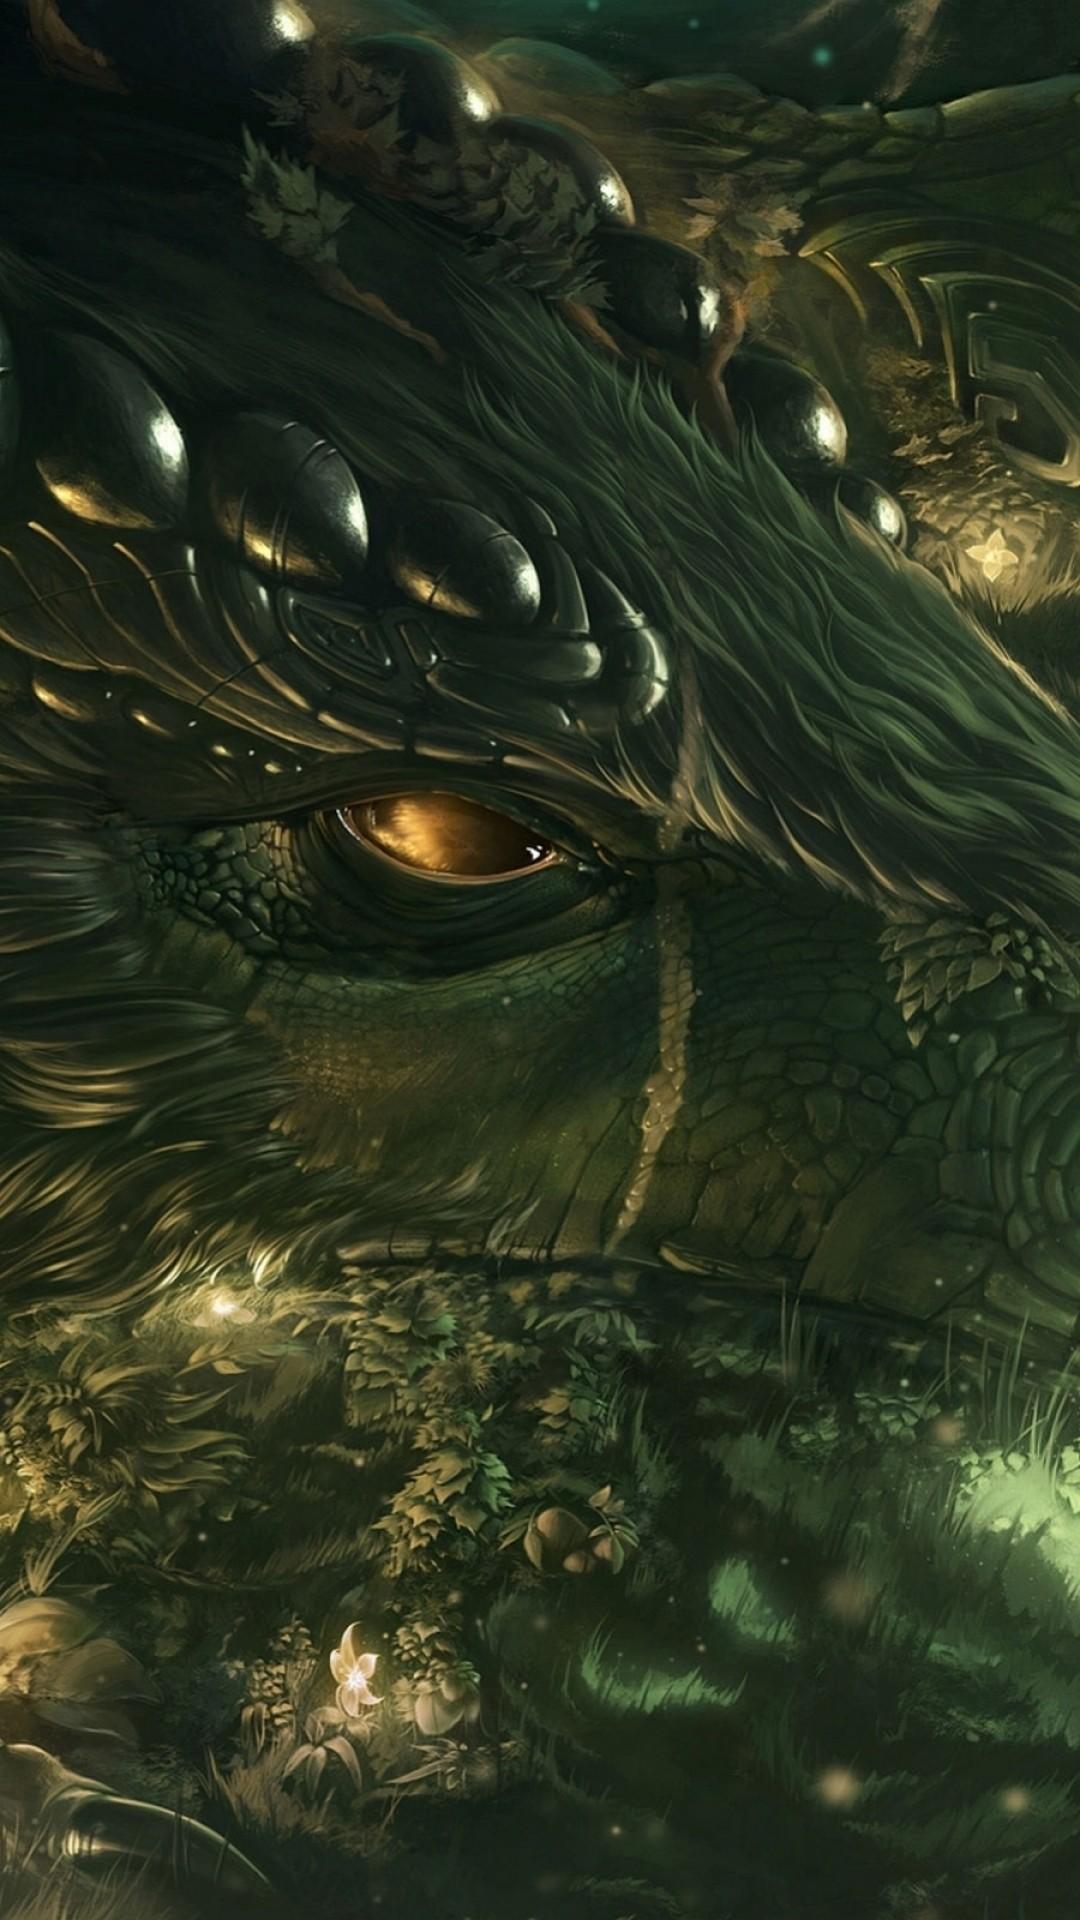 Preview wallpaper dragon, girl, forest, art 1080×1920